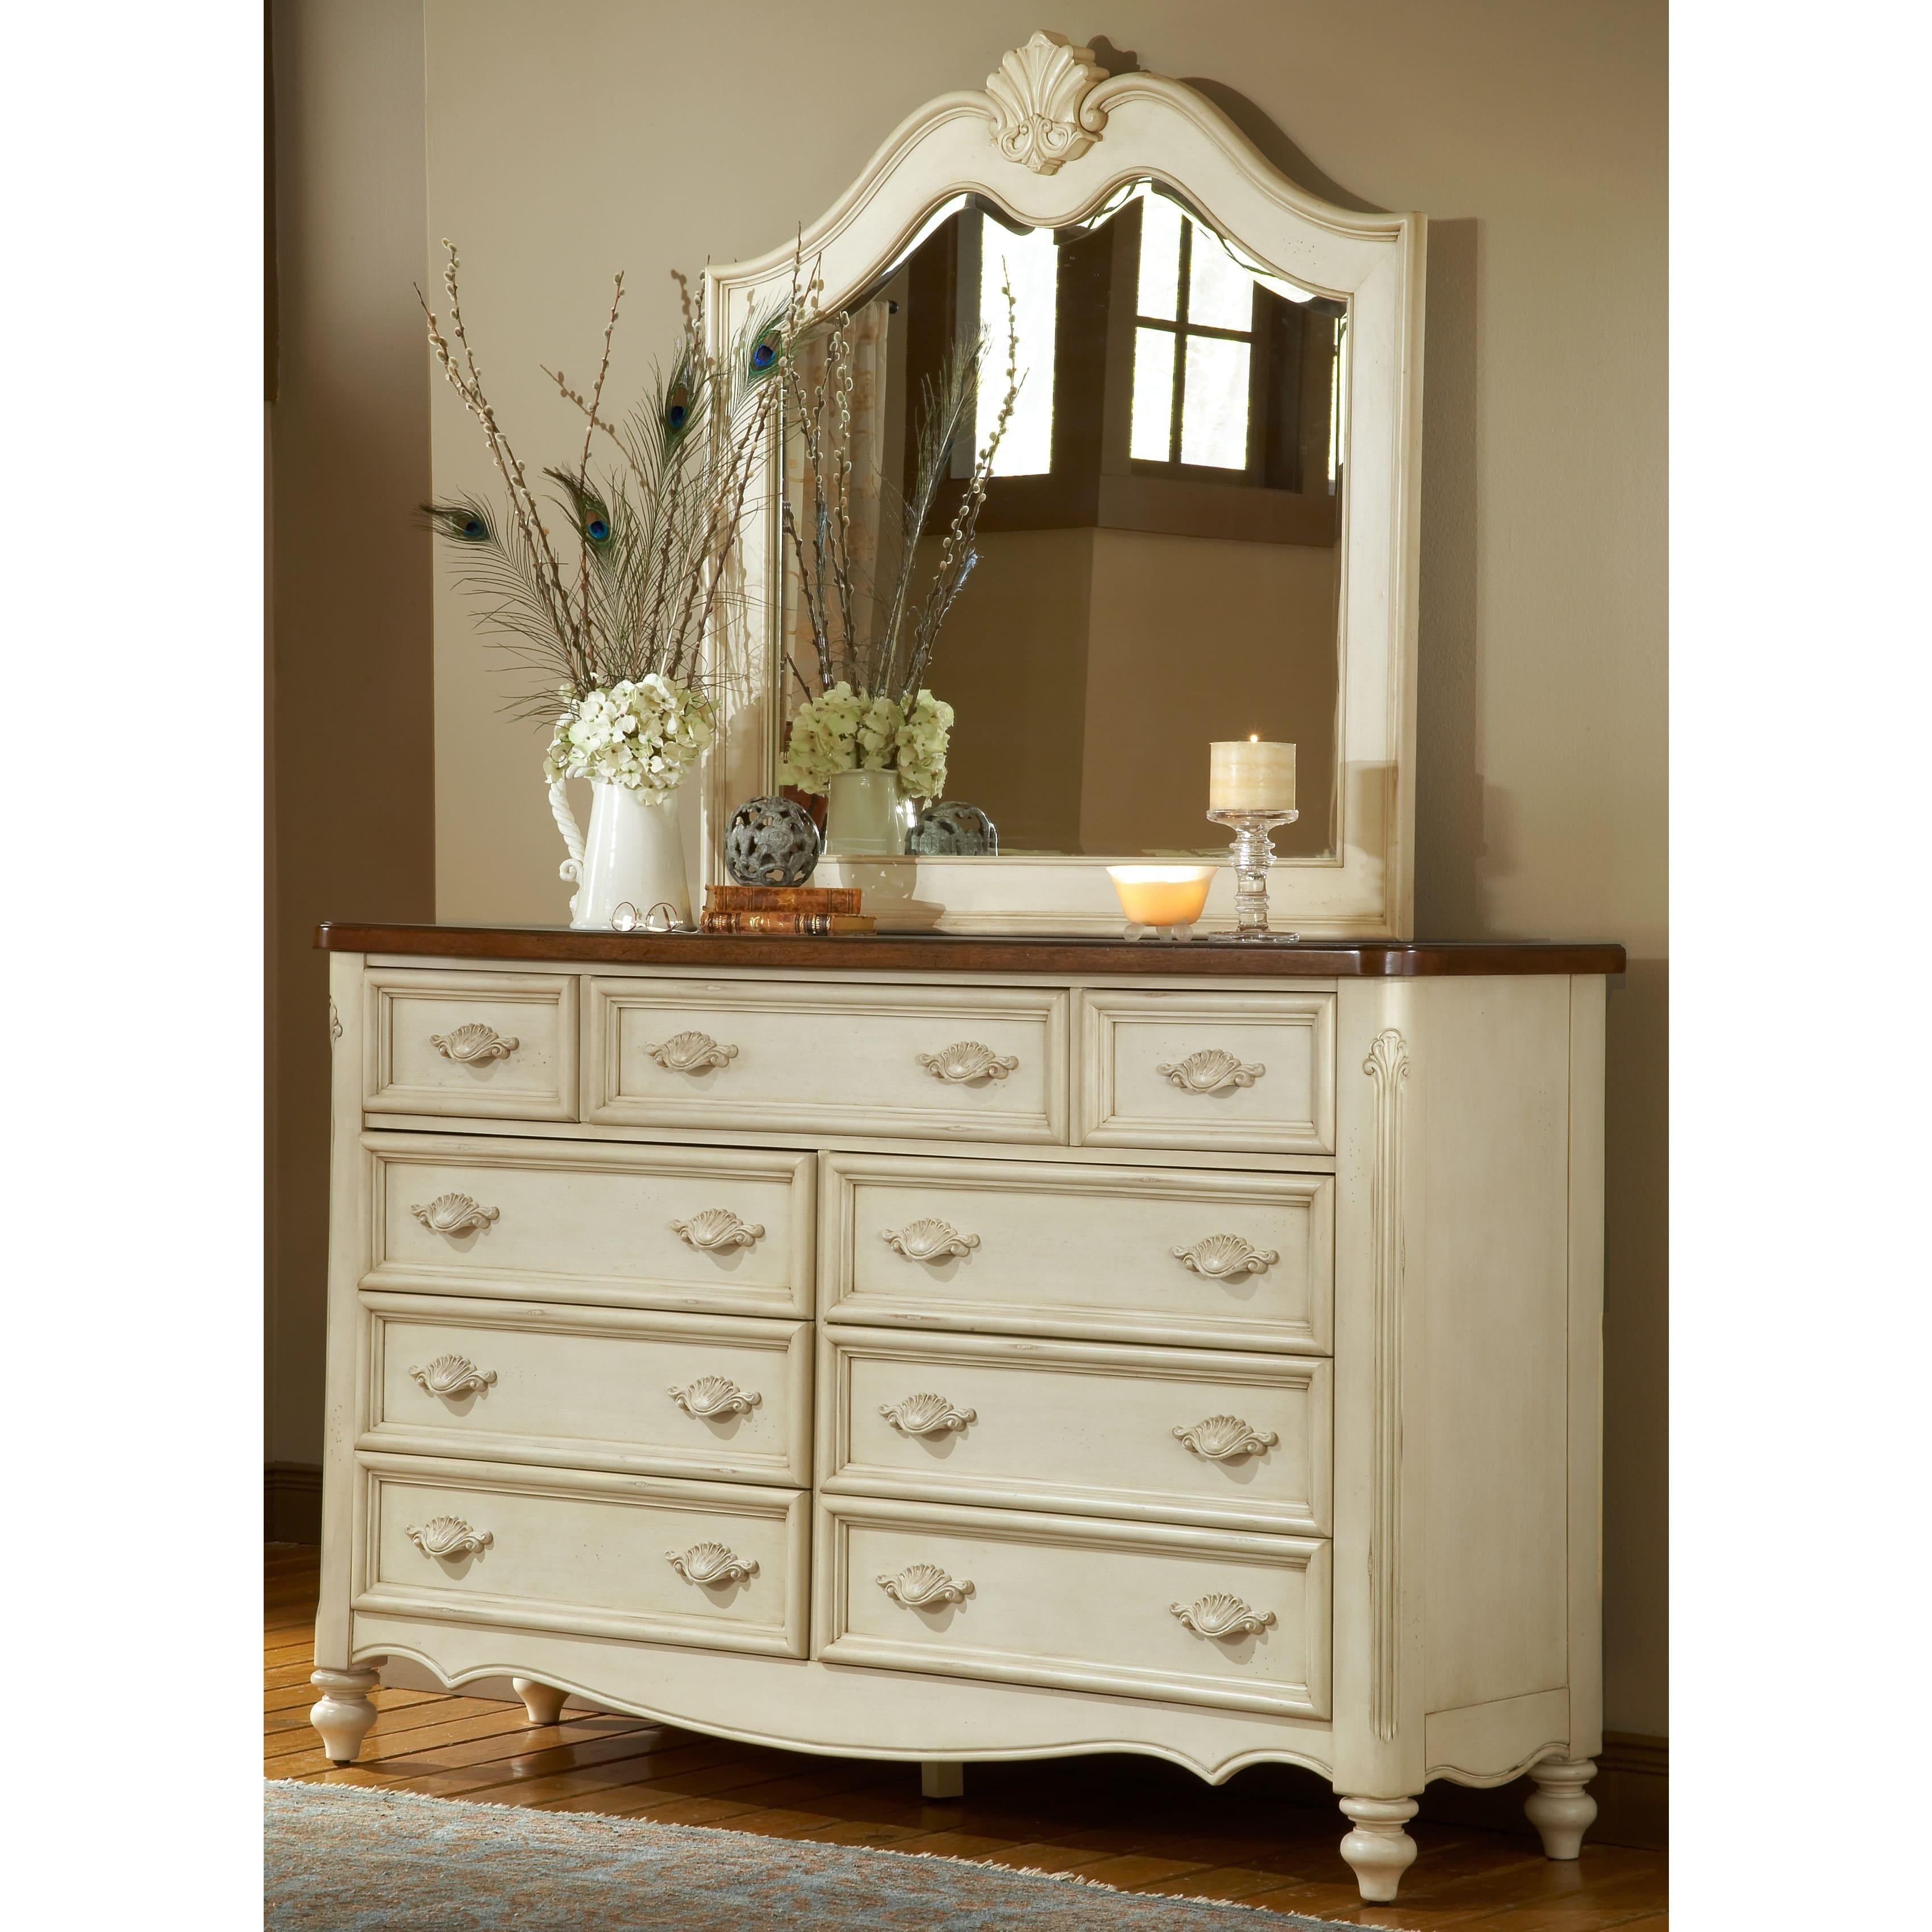 Bedroom Furniture Sales Online: Buy Dressers & Chests Online At Overstock